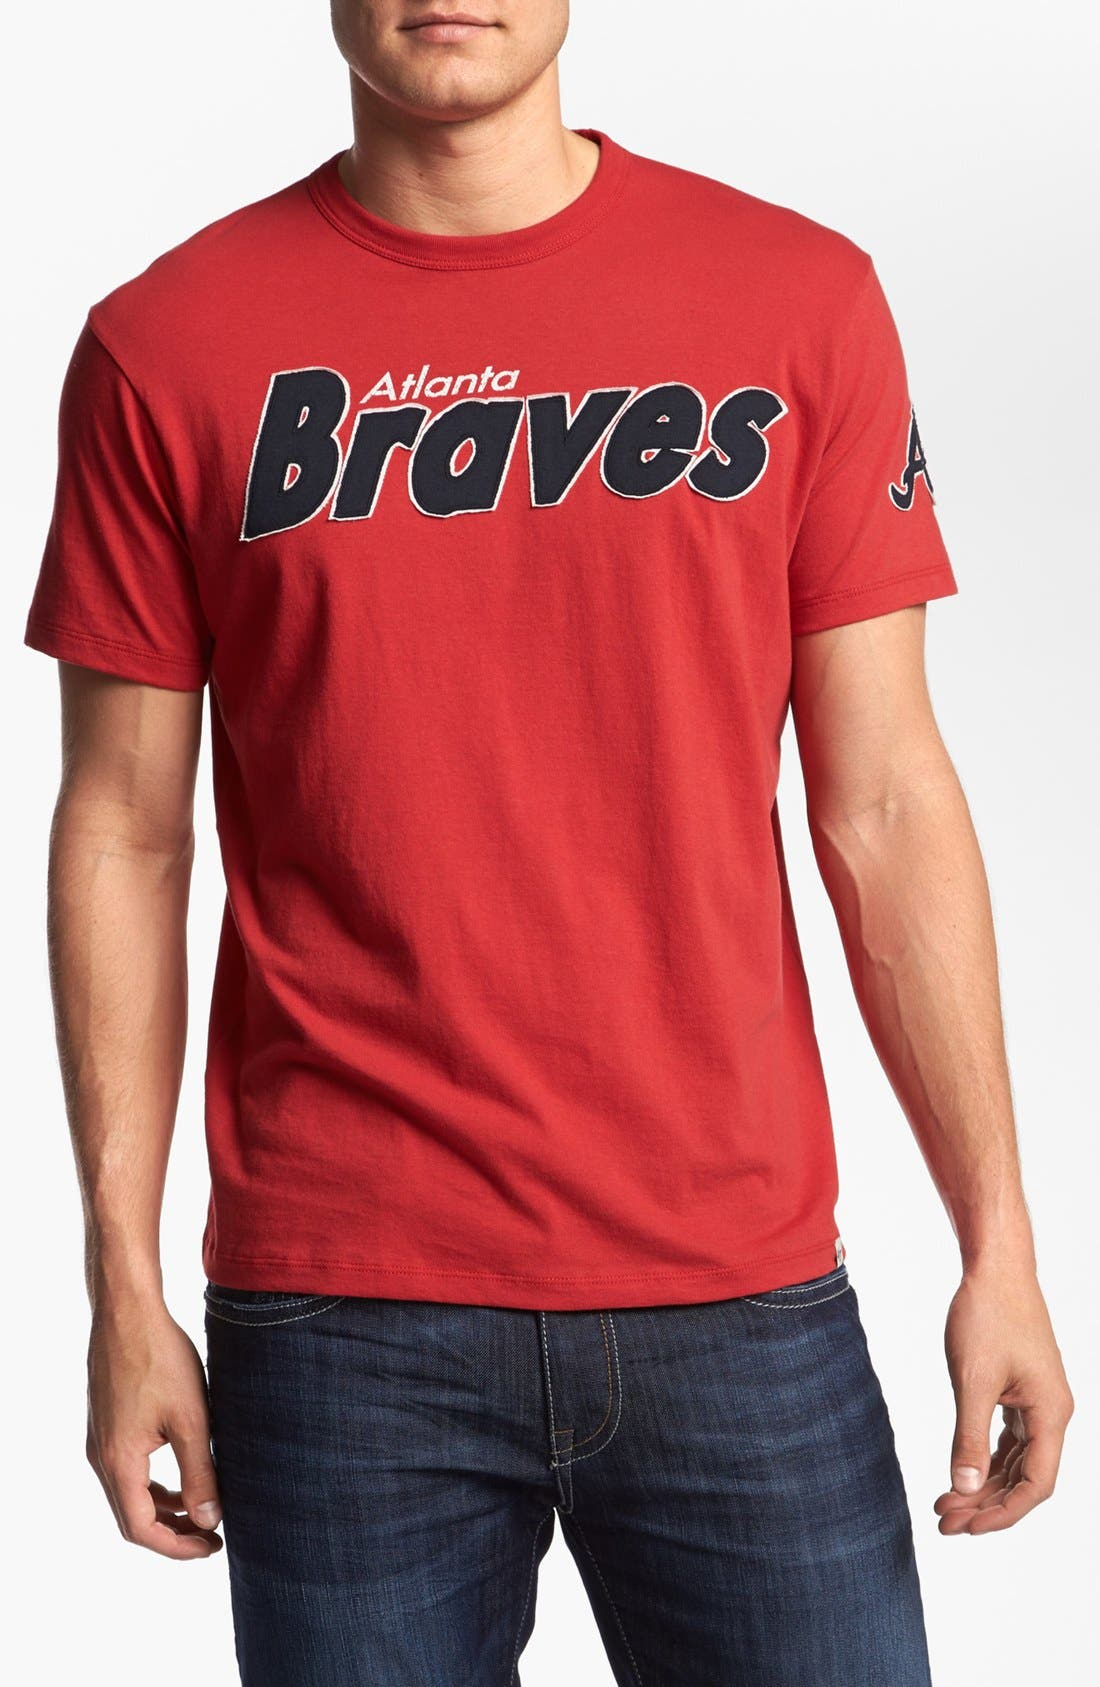 Main Image - 47 Brand 'Atlanta Braves - Fieldhouse' T-Shirt